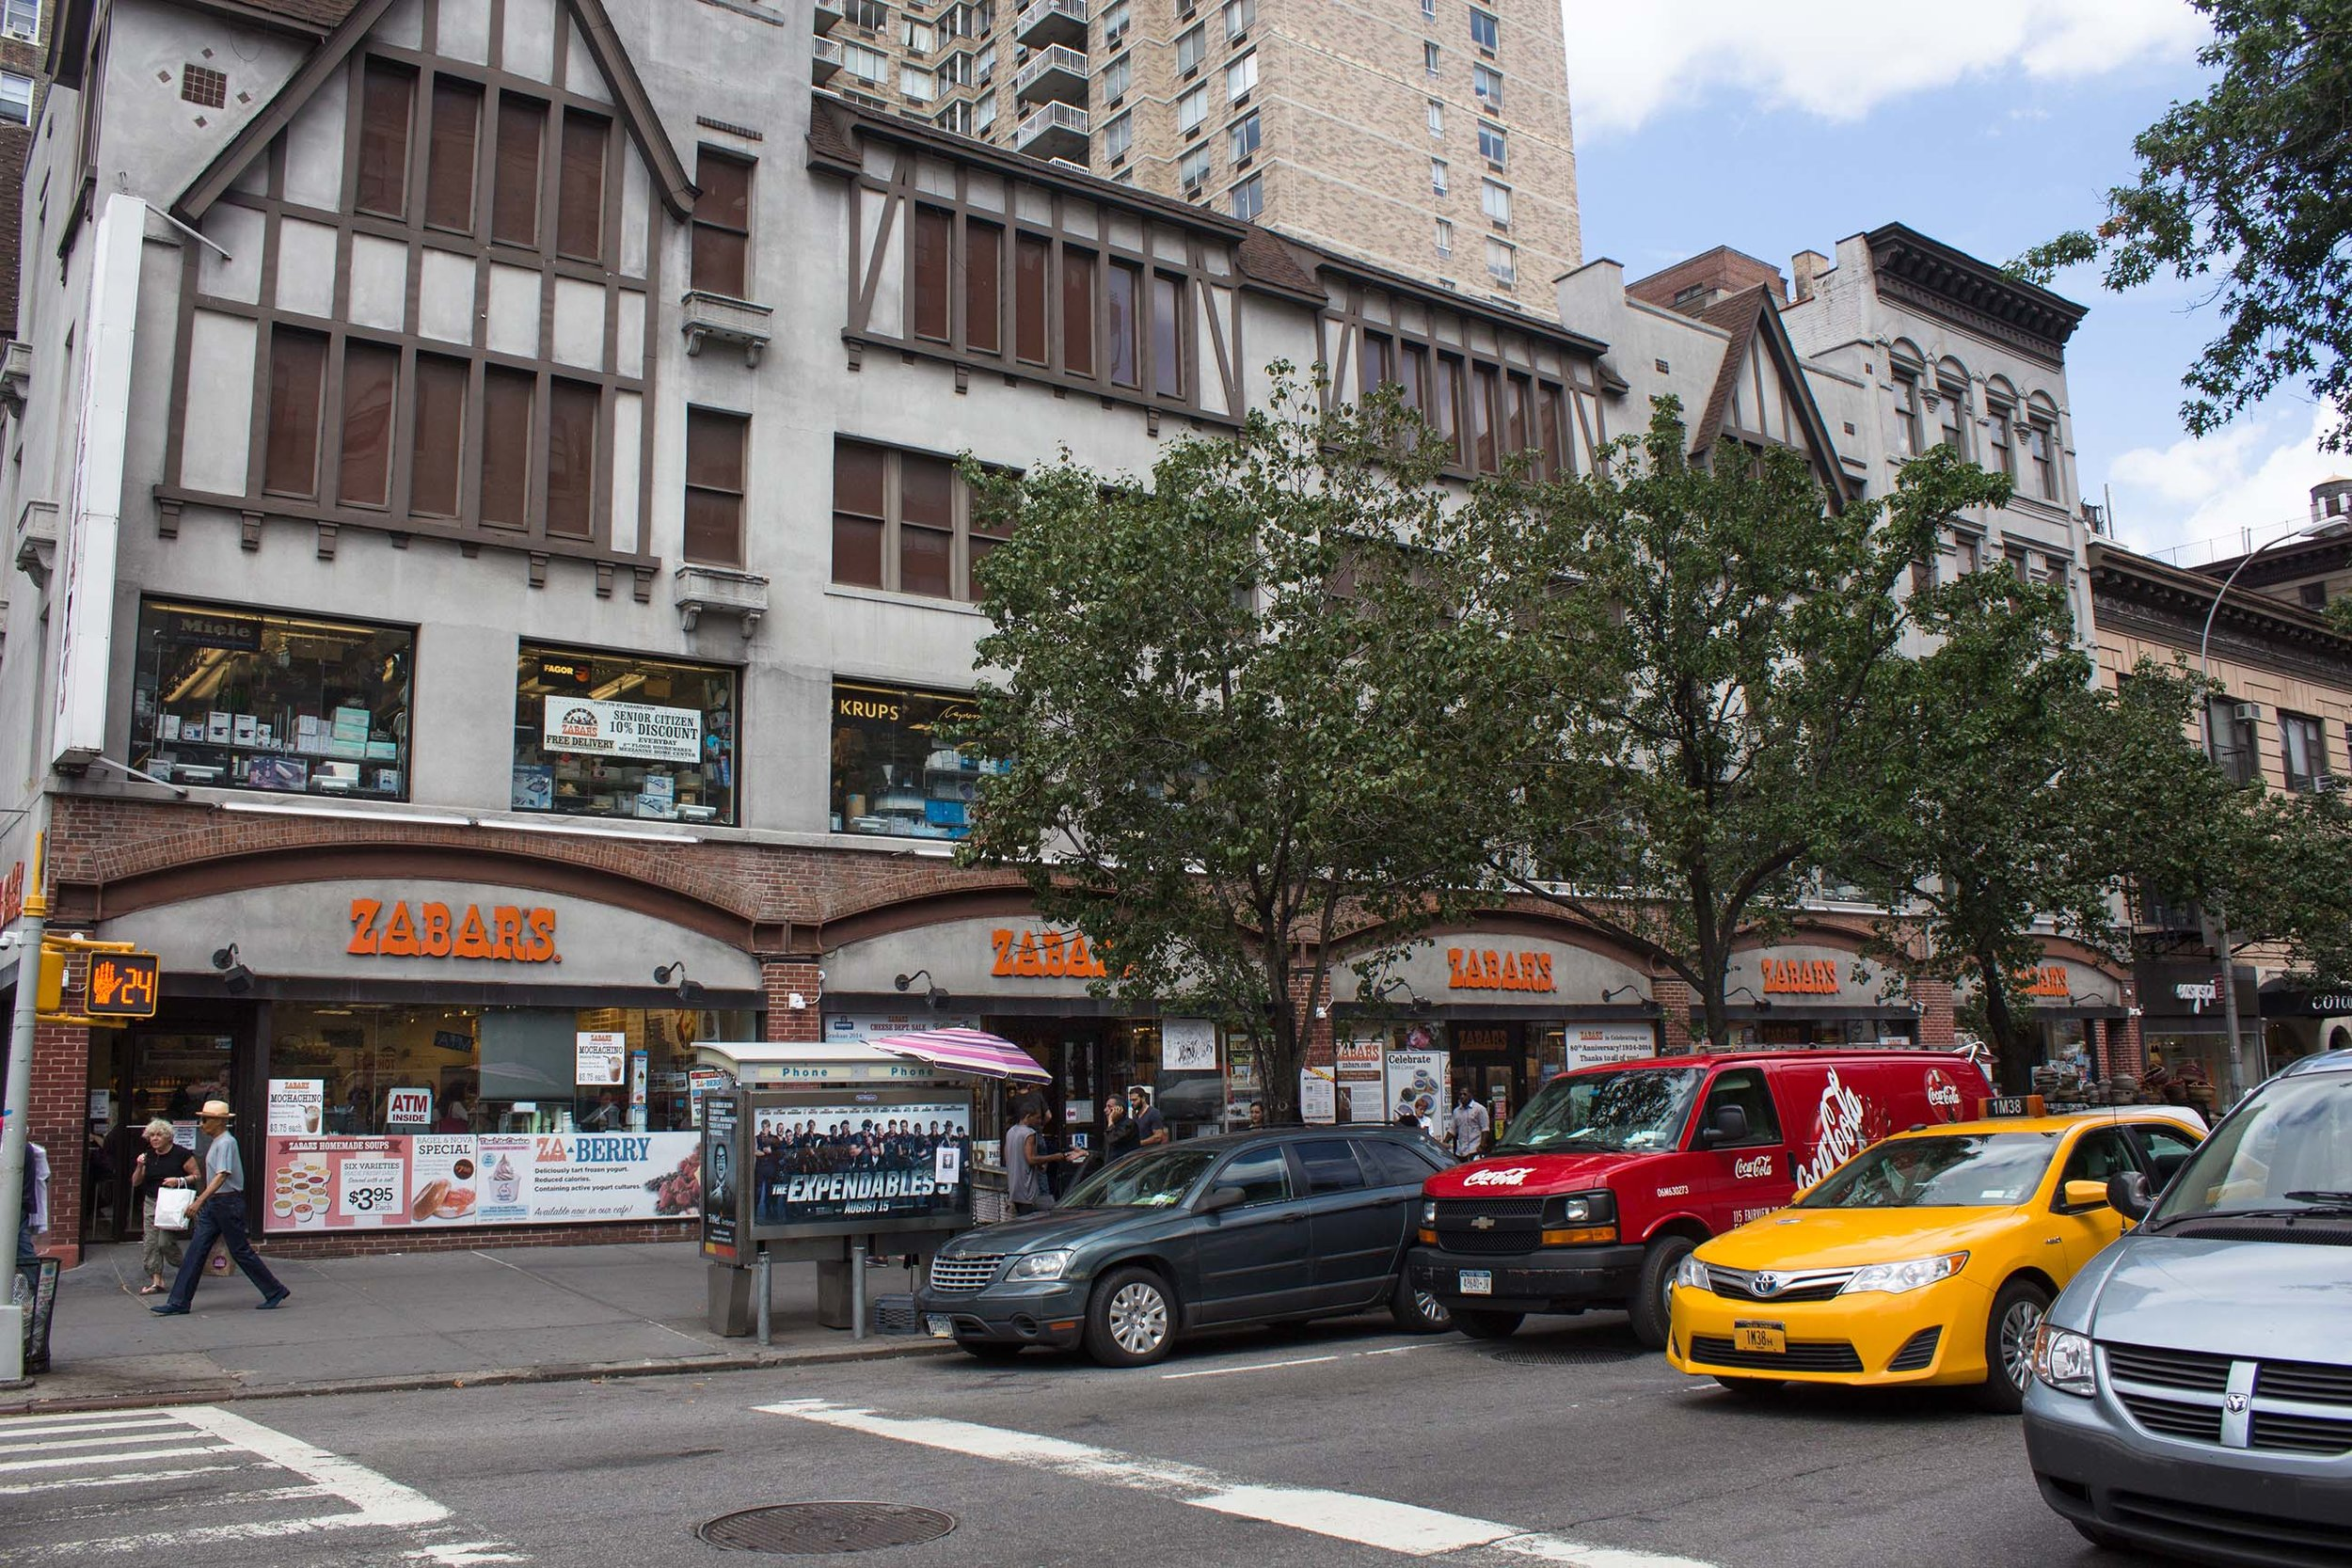 Chinatown Hires-1.jpg